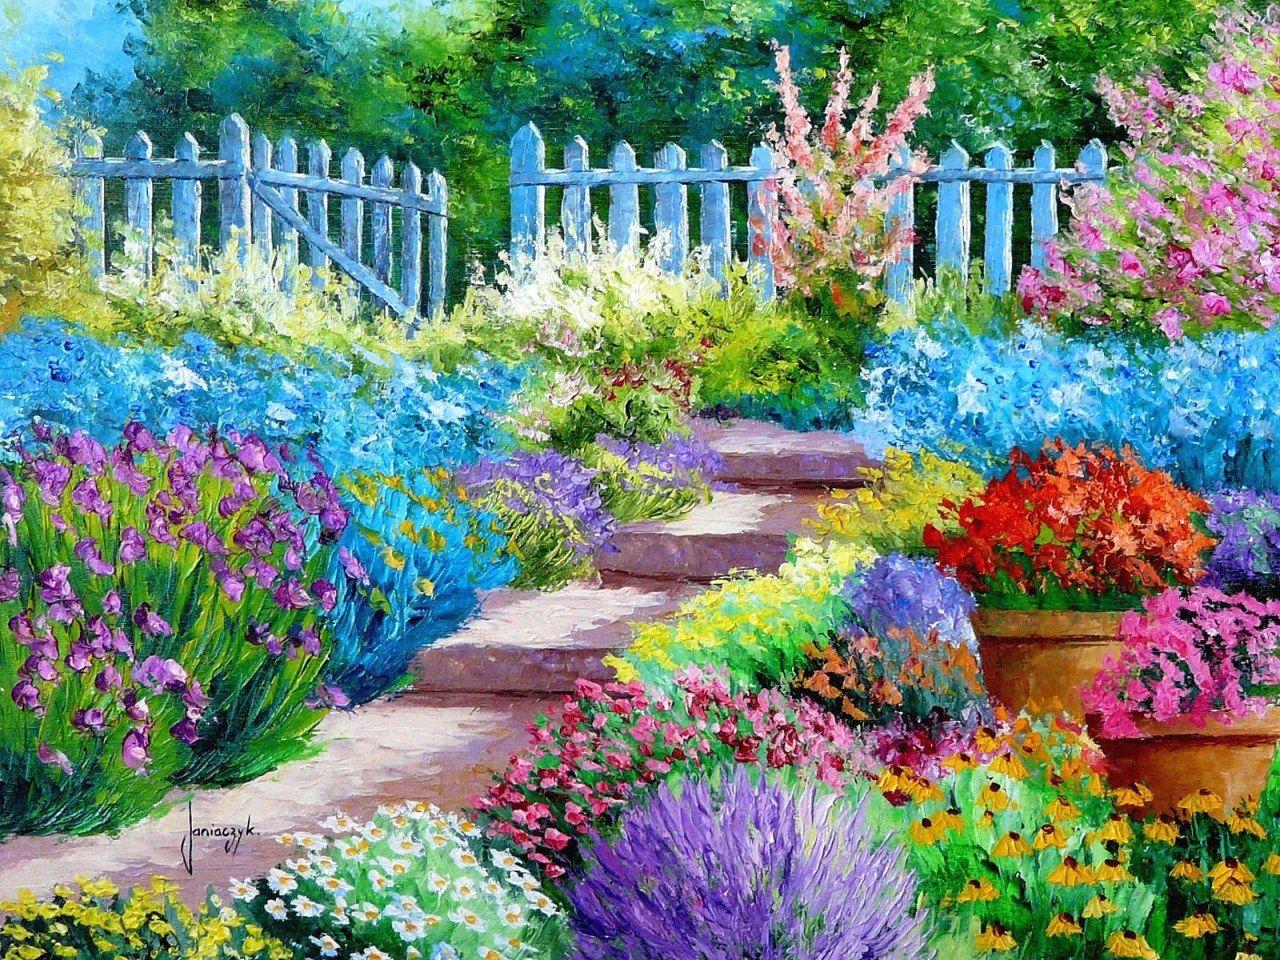 Simple Flower Garden Paintings jean-marc janiaczyk – flower garden painting widescreen wallpaper